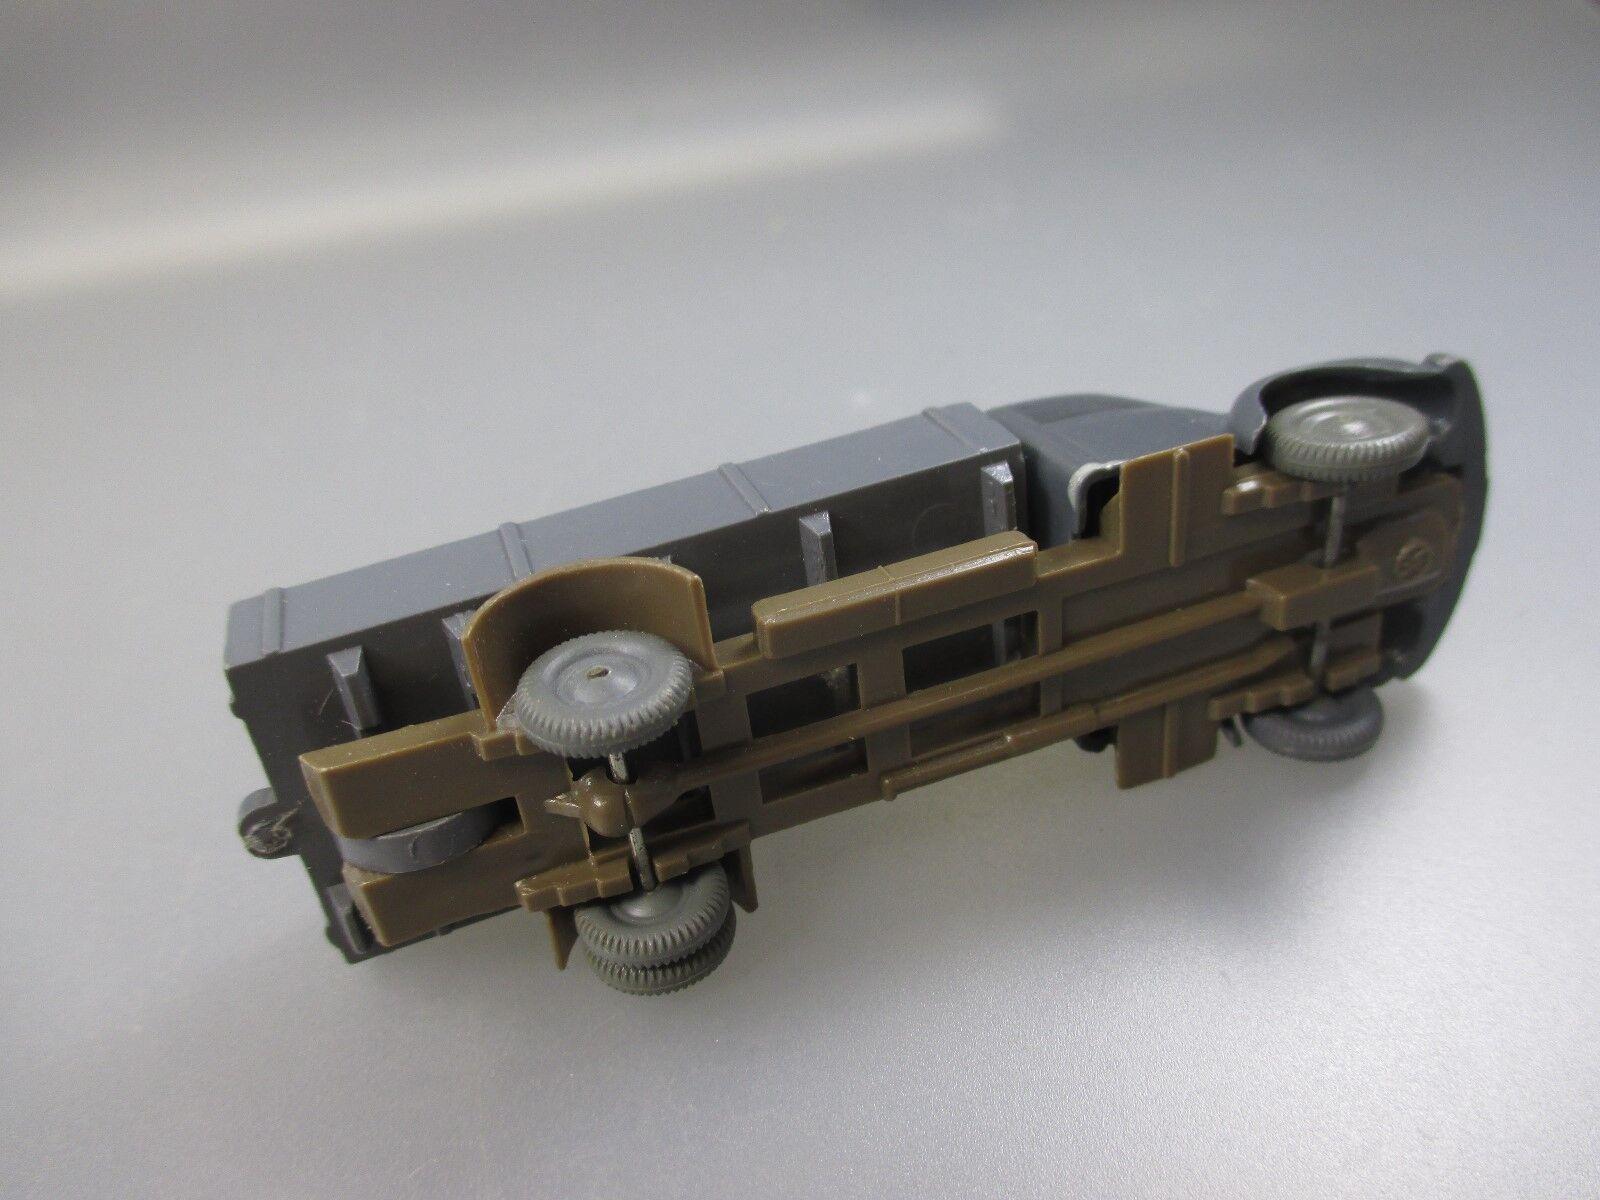 Wiking  Magirus pritschenwagen, lunas (impulso (impulso (impulso 29) a1743e